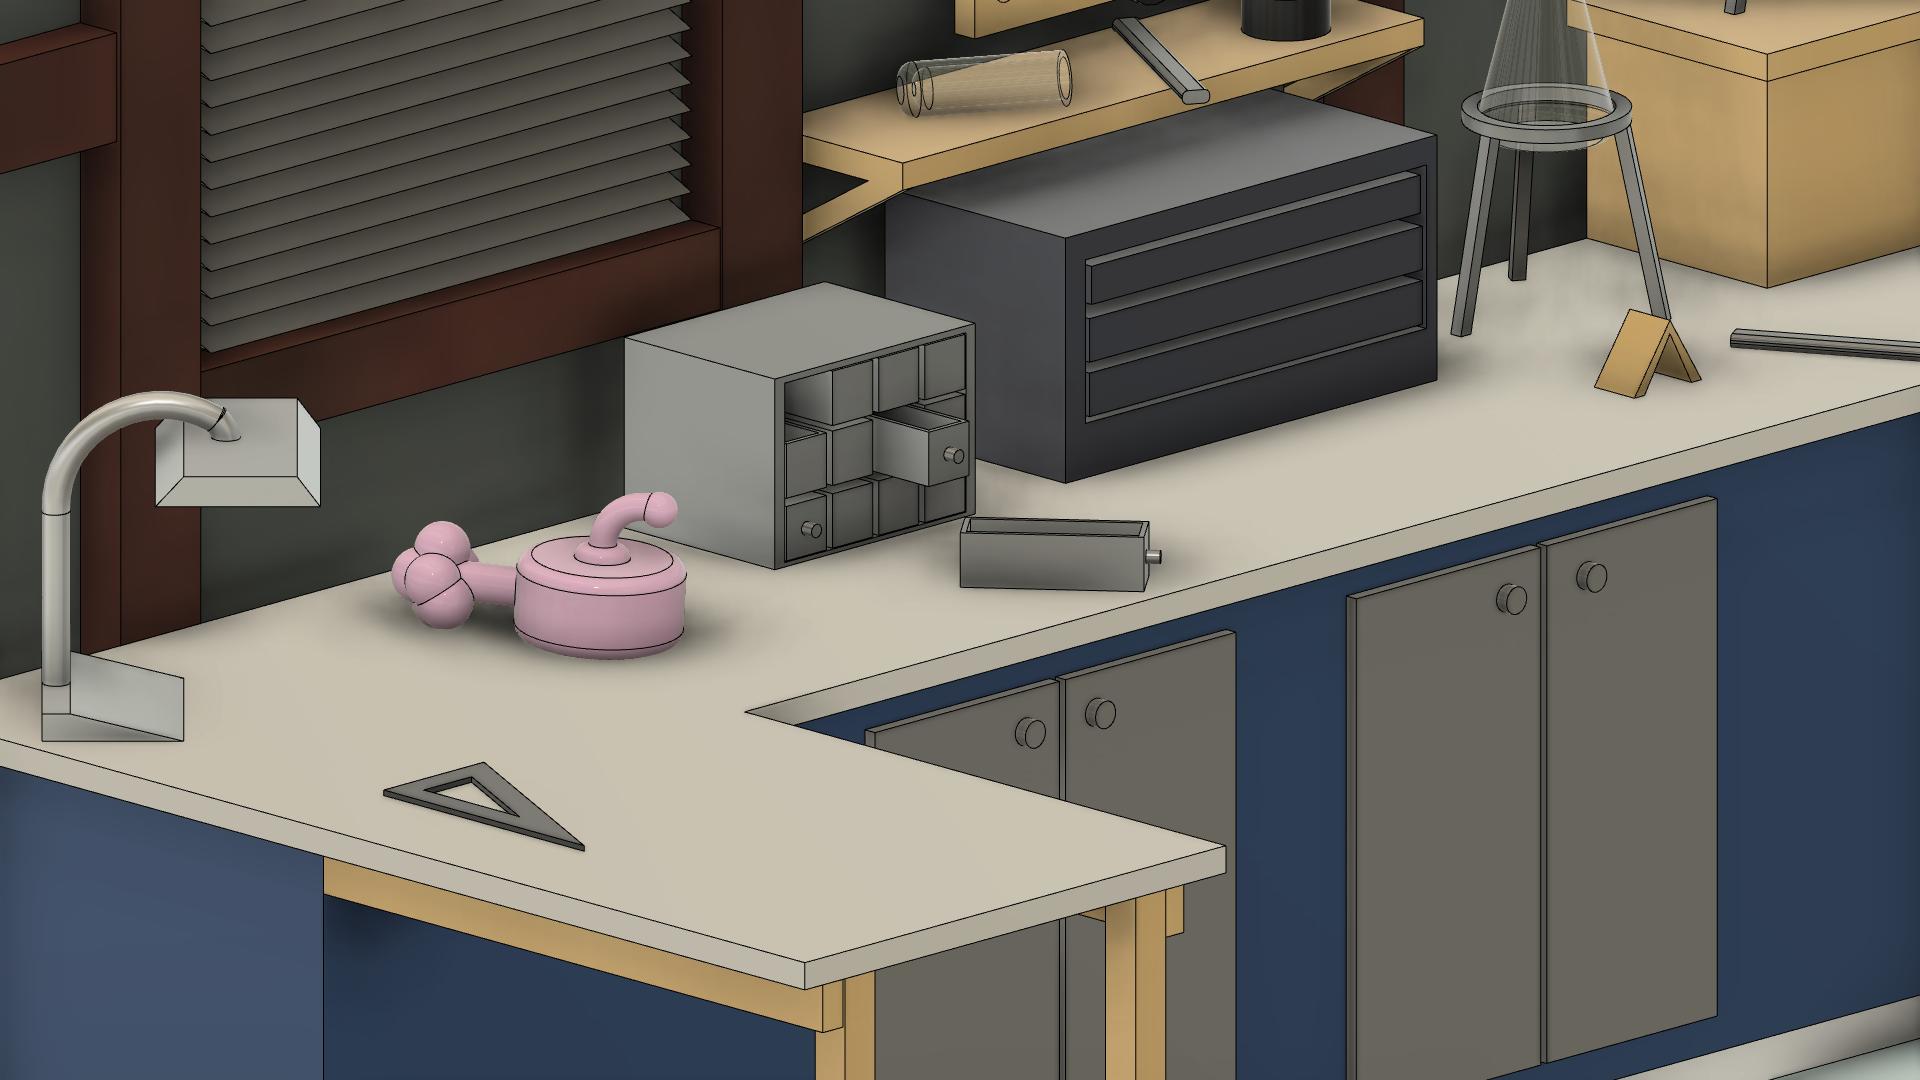 RickAndMortyGarage2.png Download free STL file Rick and Morty Garage • 3D printable object, lucadilorenzo98